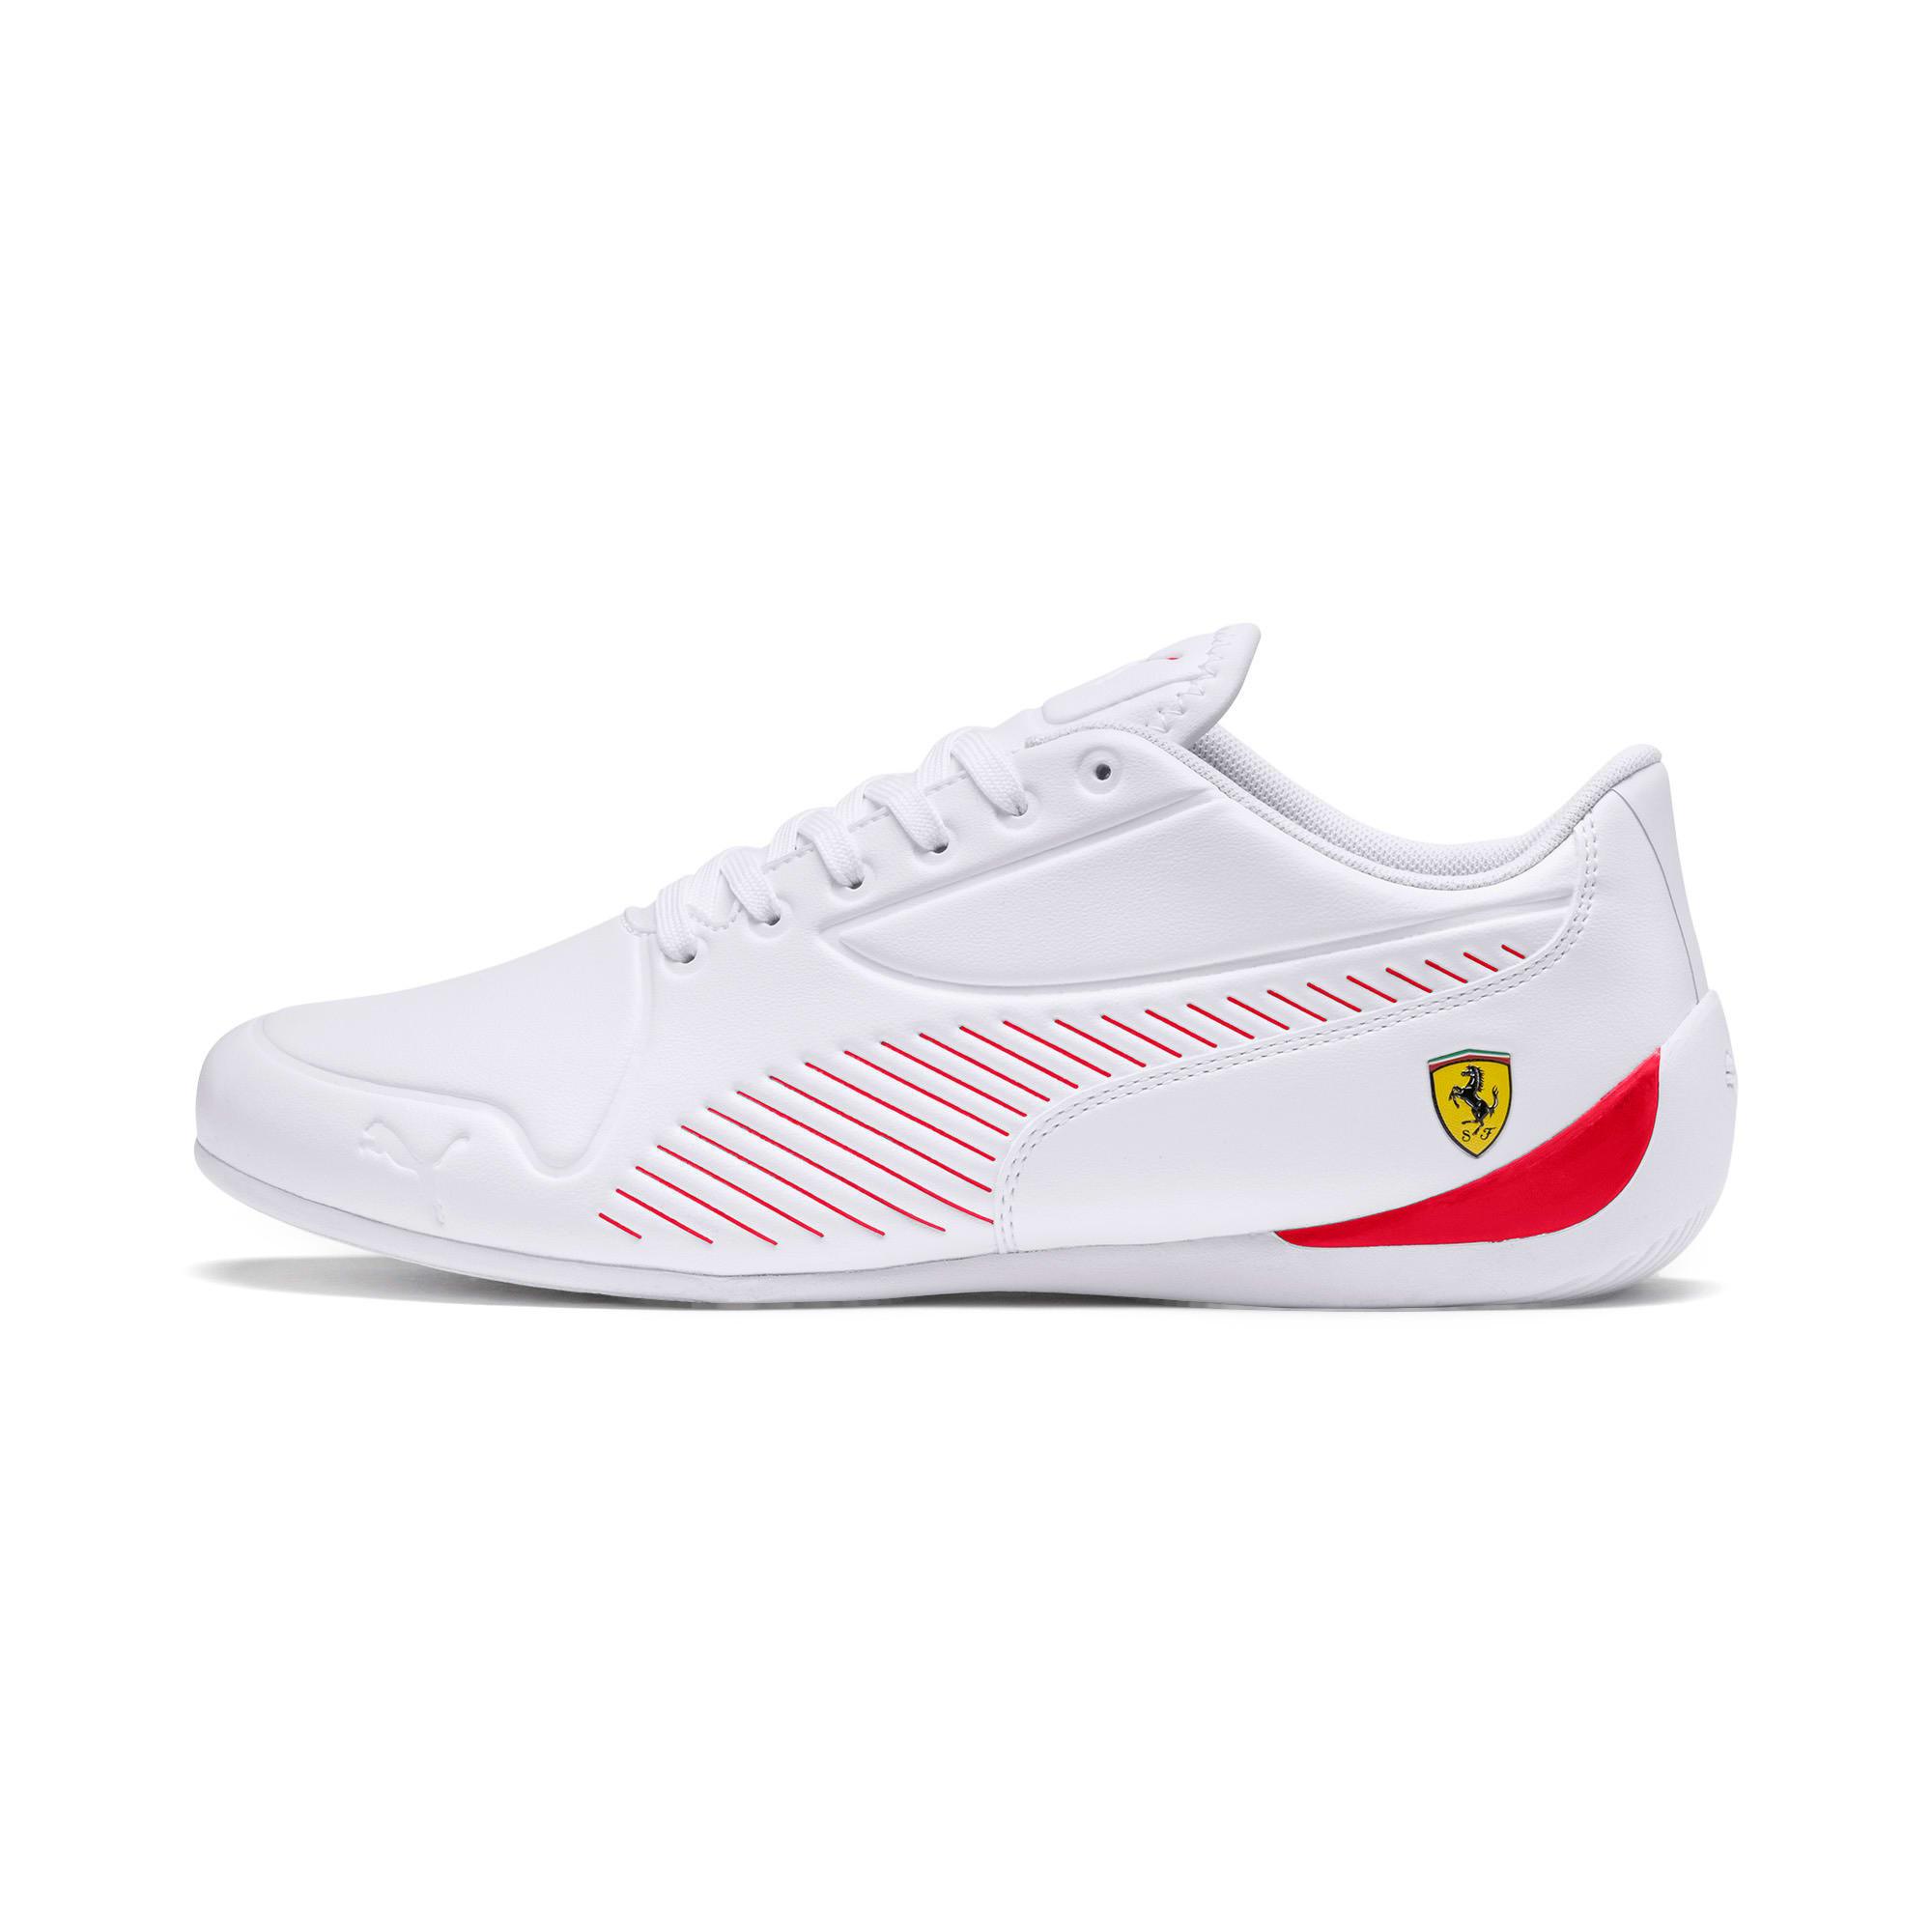 Thumbnail 1 of Scuderia Ferrari Drift Cat 7S Ultra Men's Shoes, Puma White-Rosso Corsa, medium